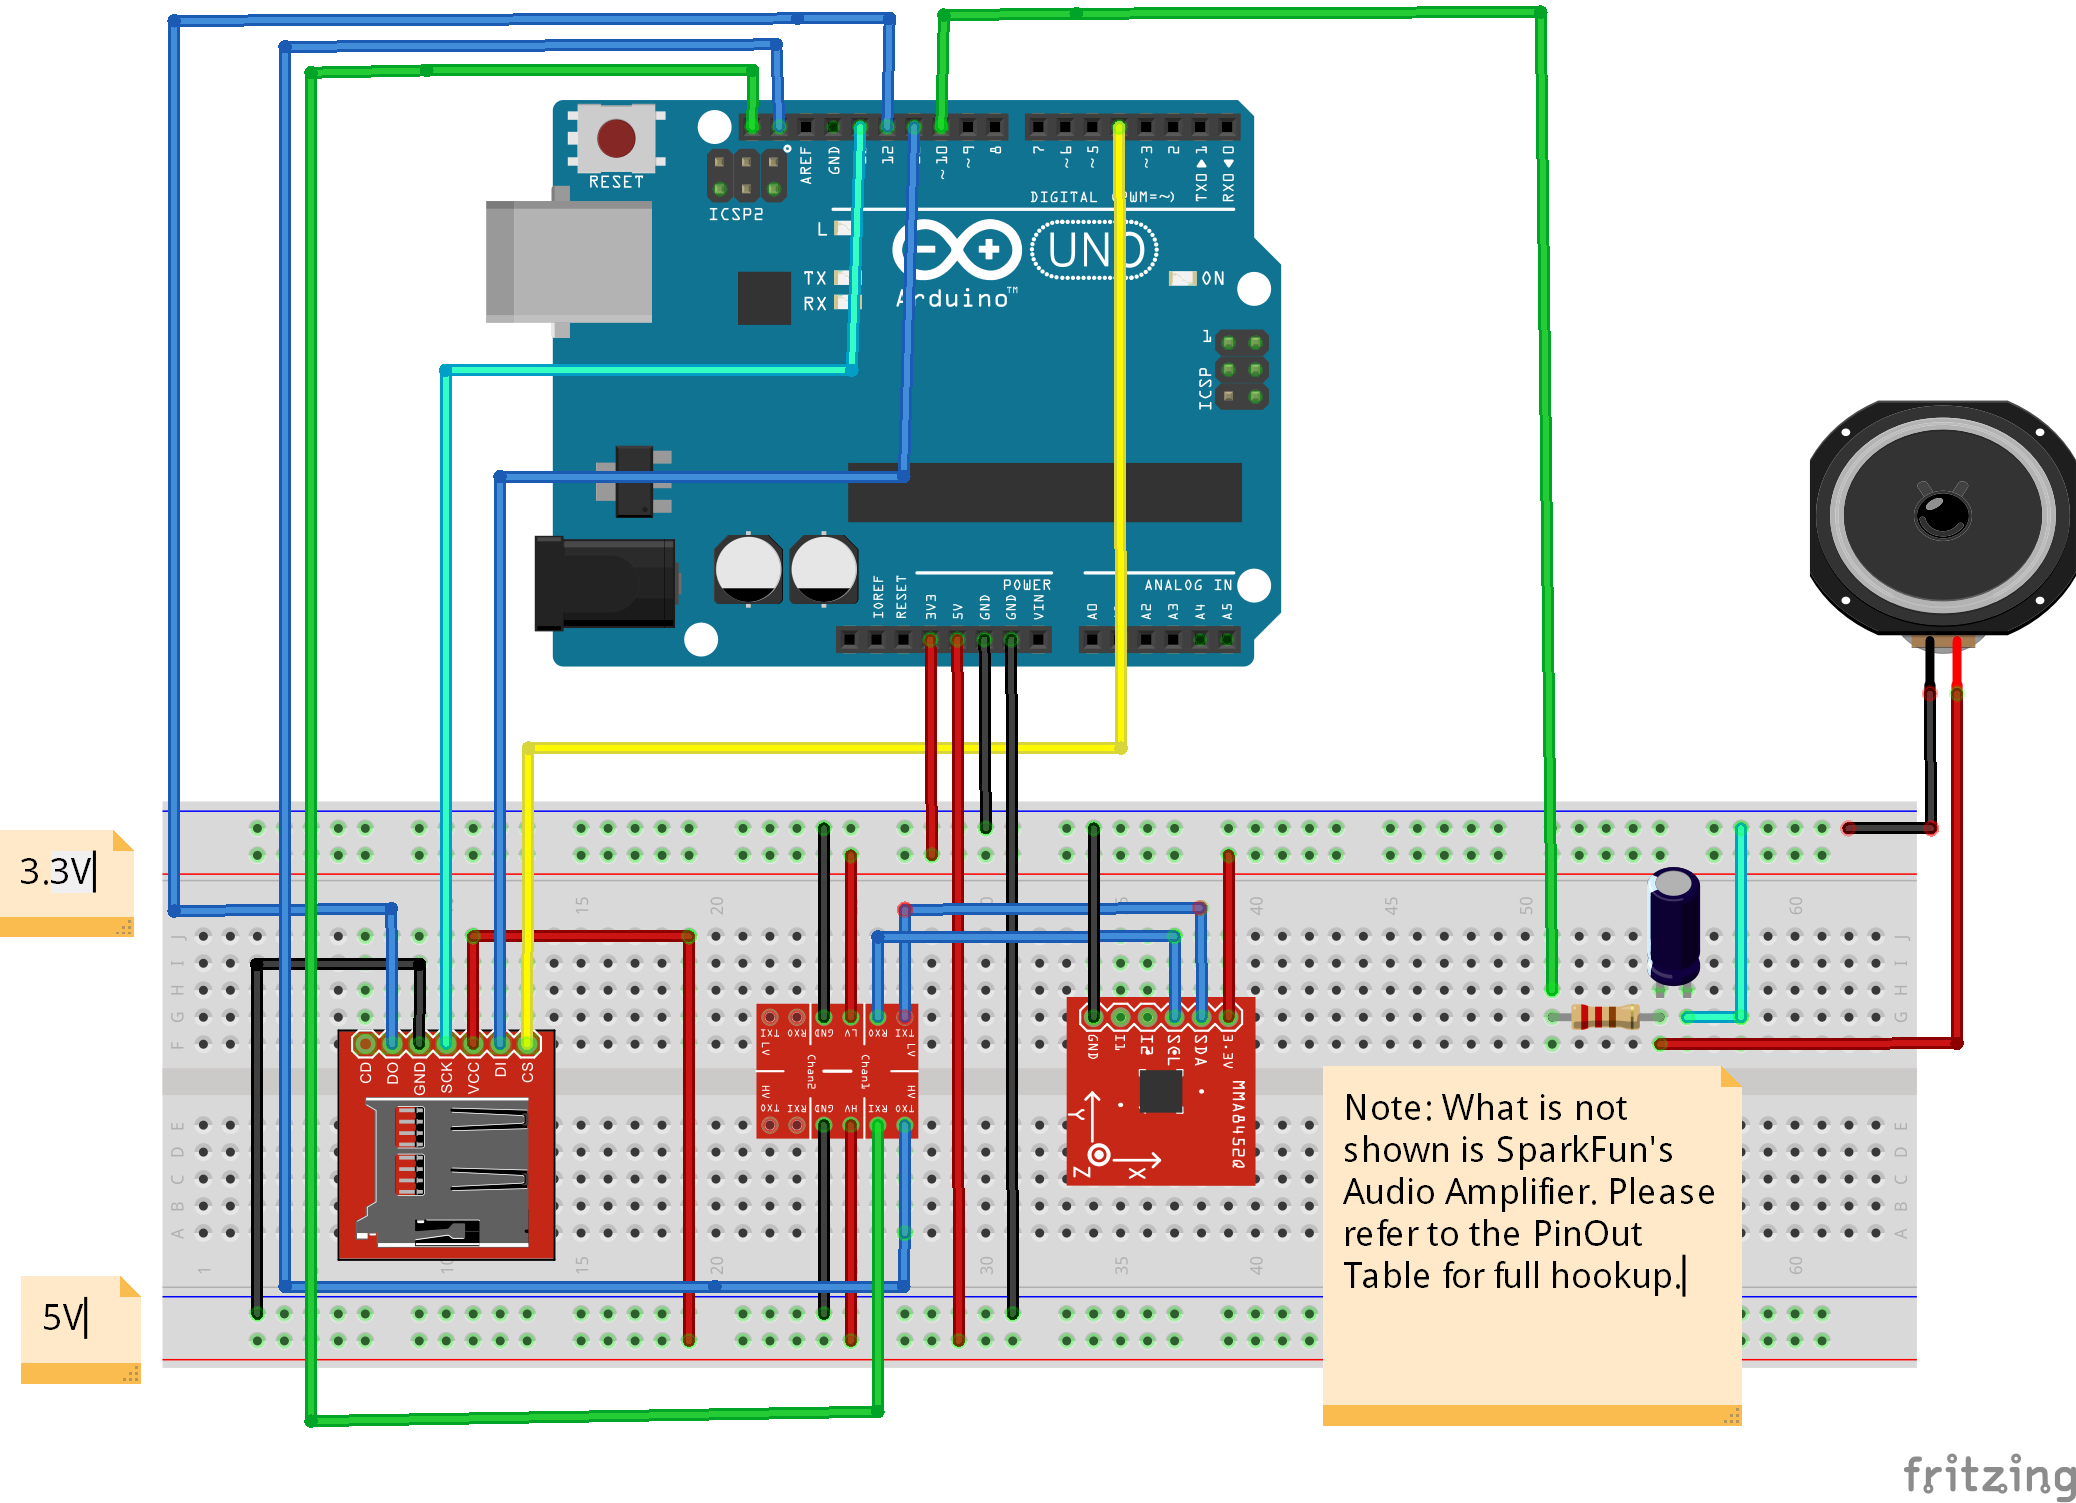 SbarkFun - News - SparkFun Electronics on arduino mosfet, arduino computer, in-wall audio amplifier, arduino microcontroller, ipad audio amplifier, raspberry pi audio amplifier, arduino microphone, design audio amplifier, arduino oscilloscope, arduino bluetooth, tv audio amplifier, diy audio amplifier, sony amplifier, hi fi amplifier, audio power amplifier, mini stereo amplifier, arduino uno data sheet, surround sound amplifier, wifi audio amplifier,